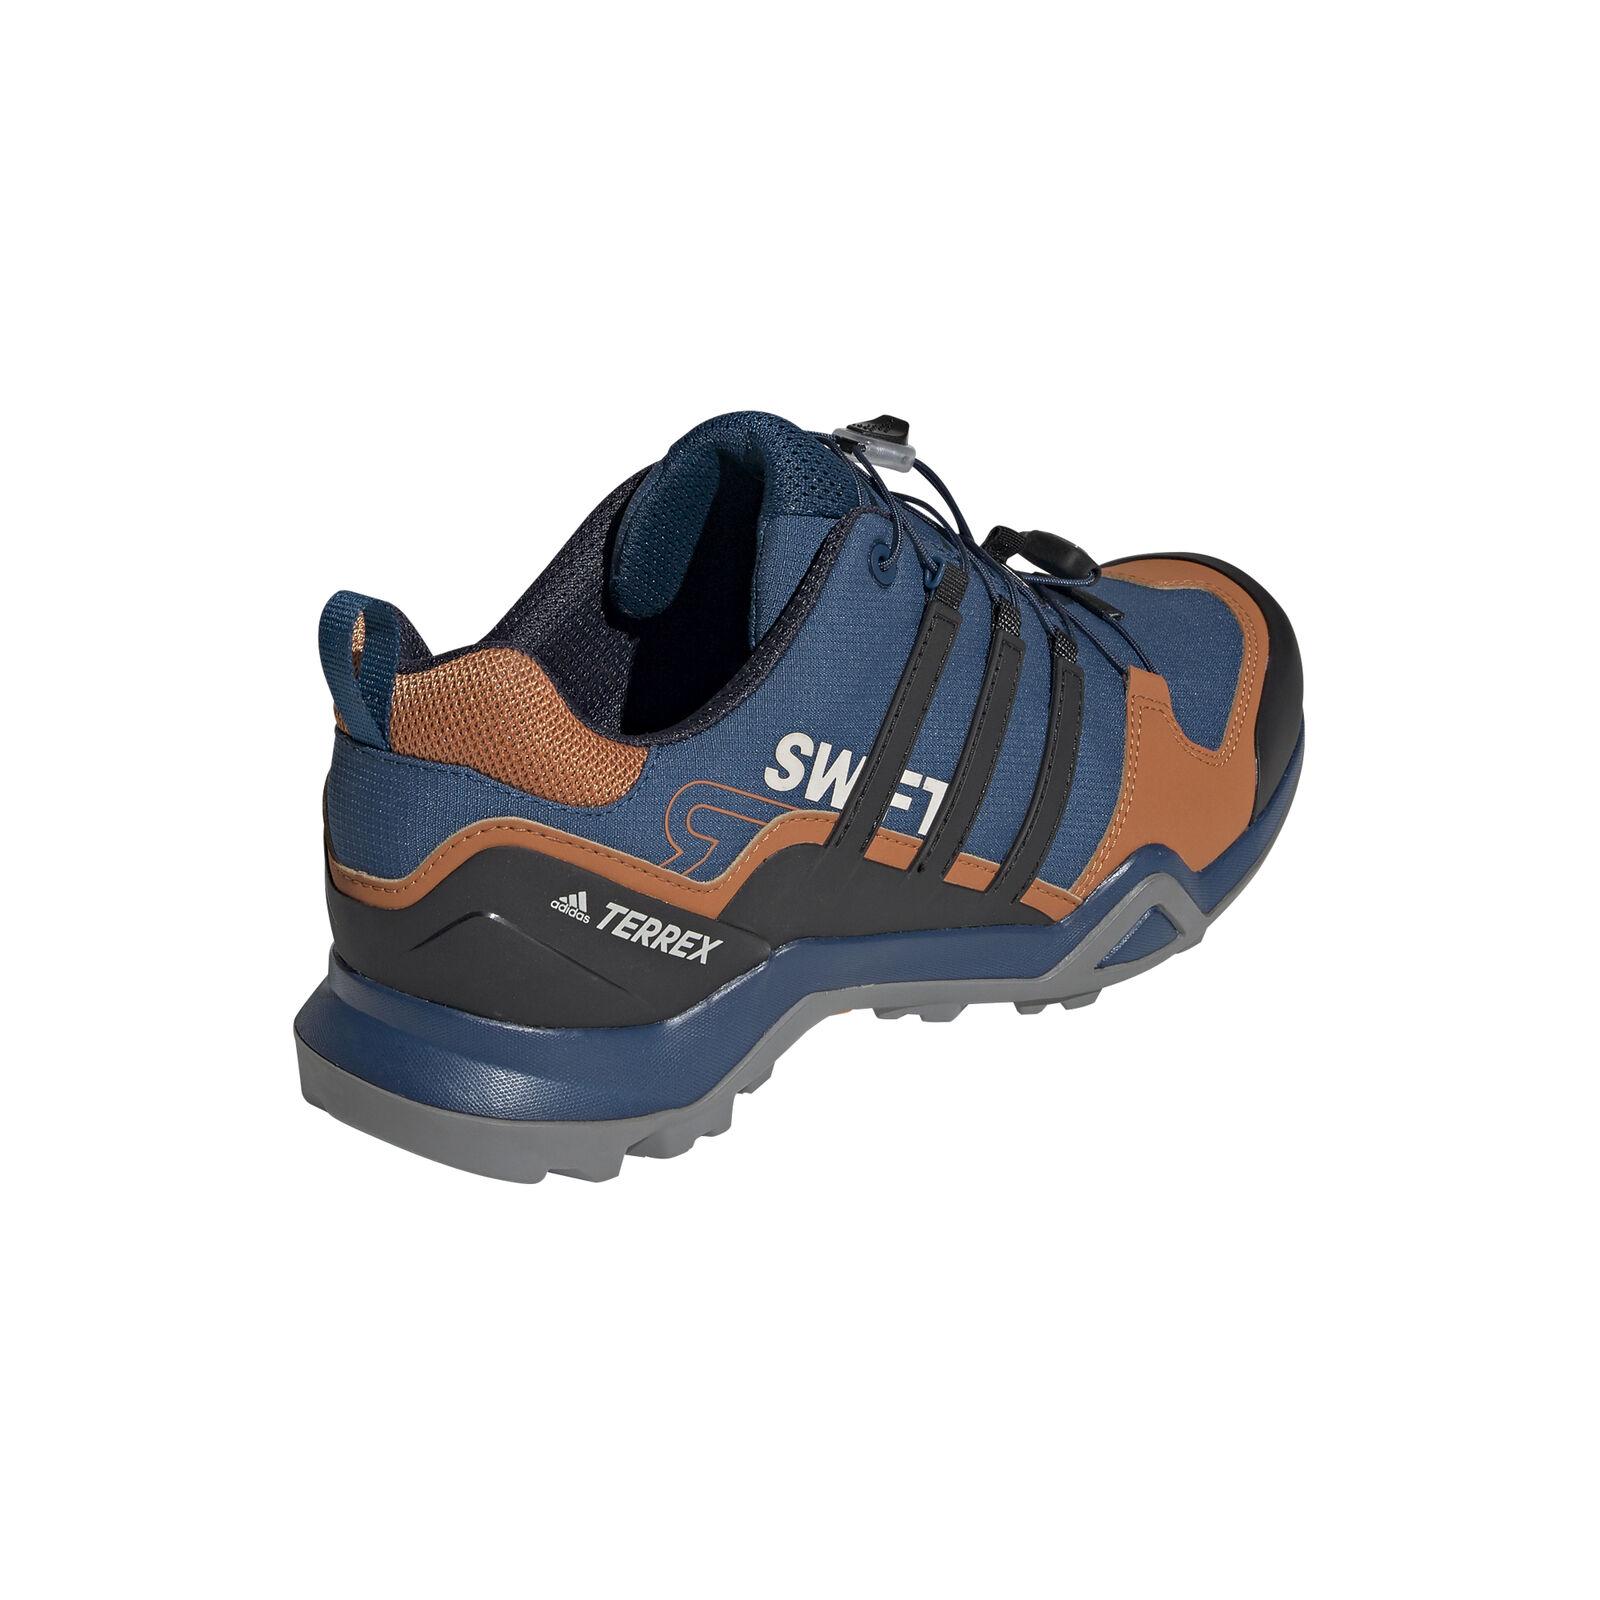 Adidas TERREX SWIFT R2 Herren Outdoorschuhe Trekkingschuhe